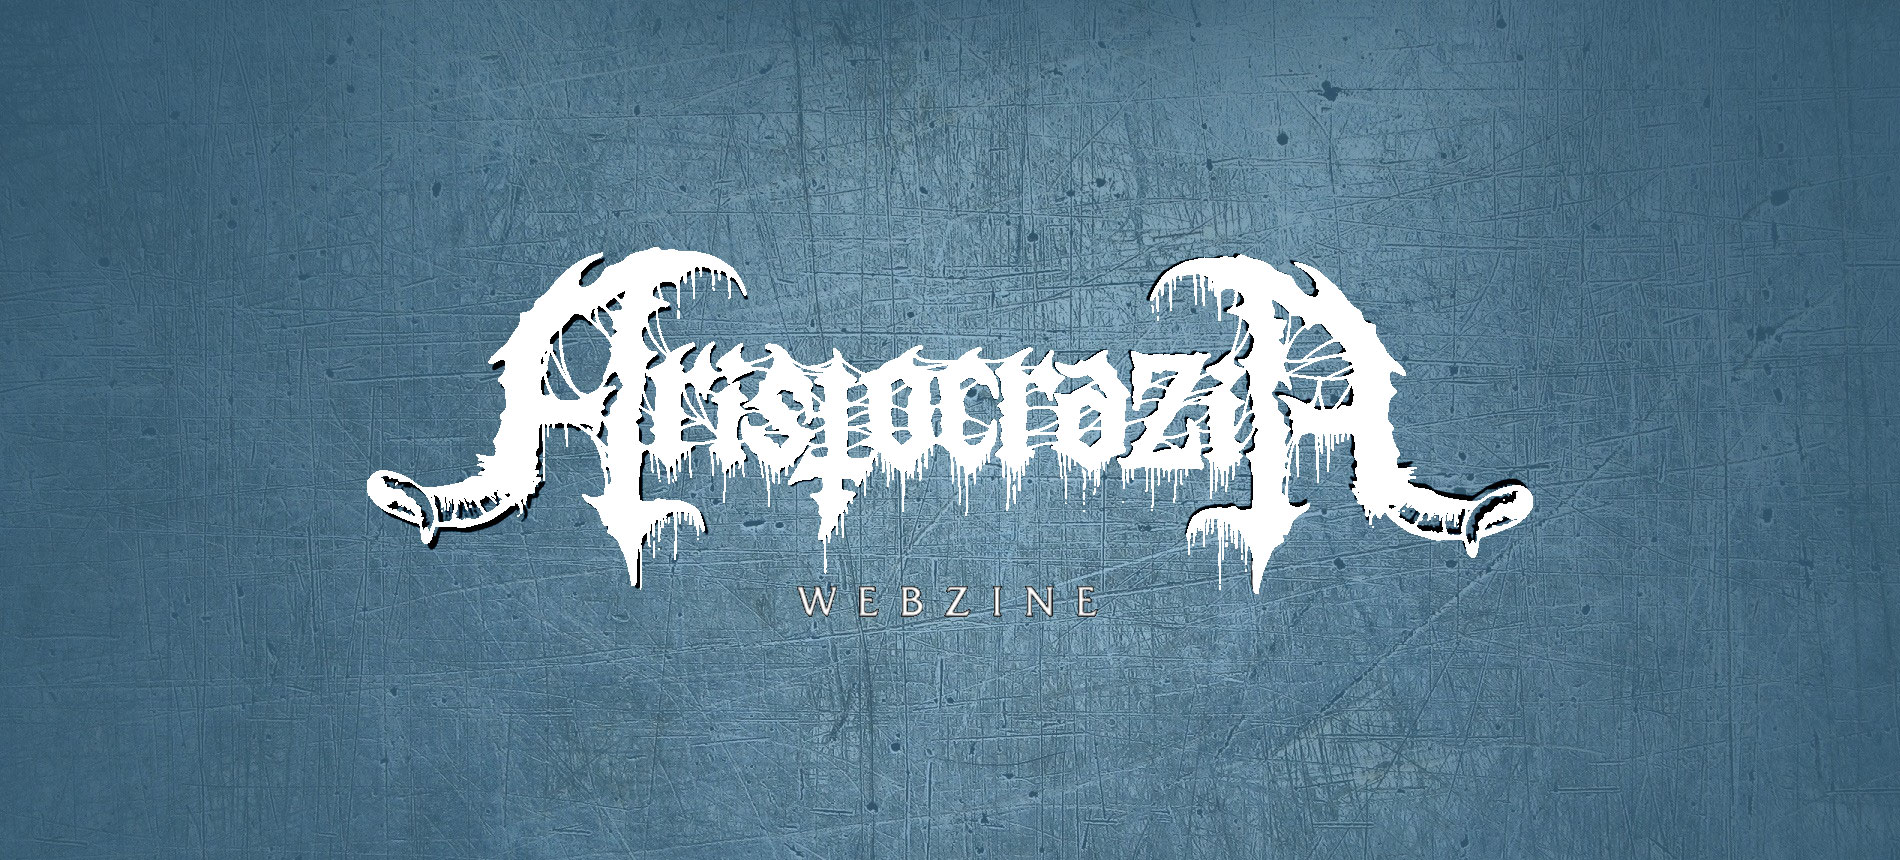 Aristocrazia Webzine